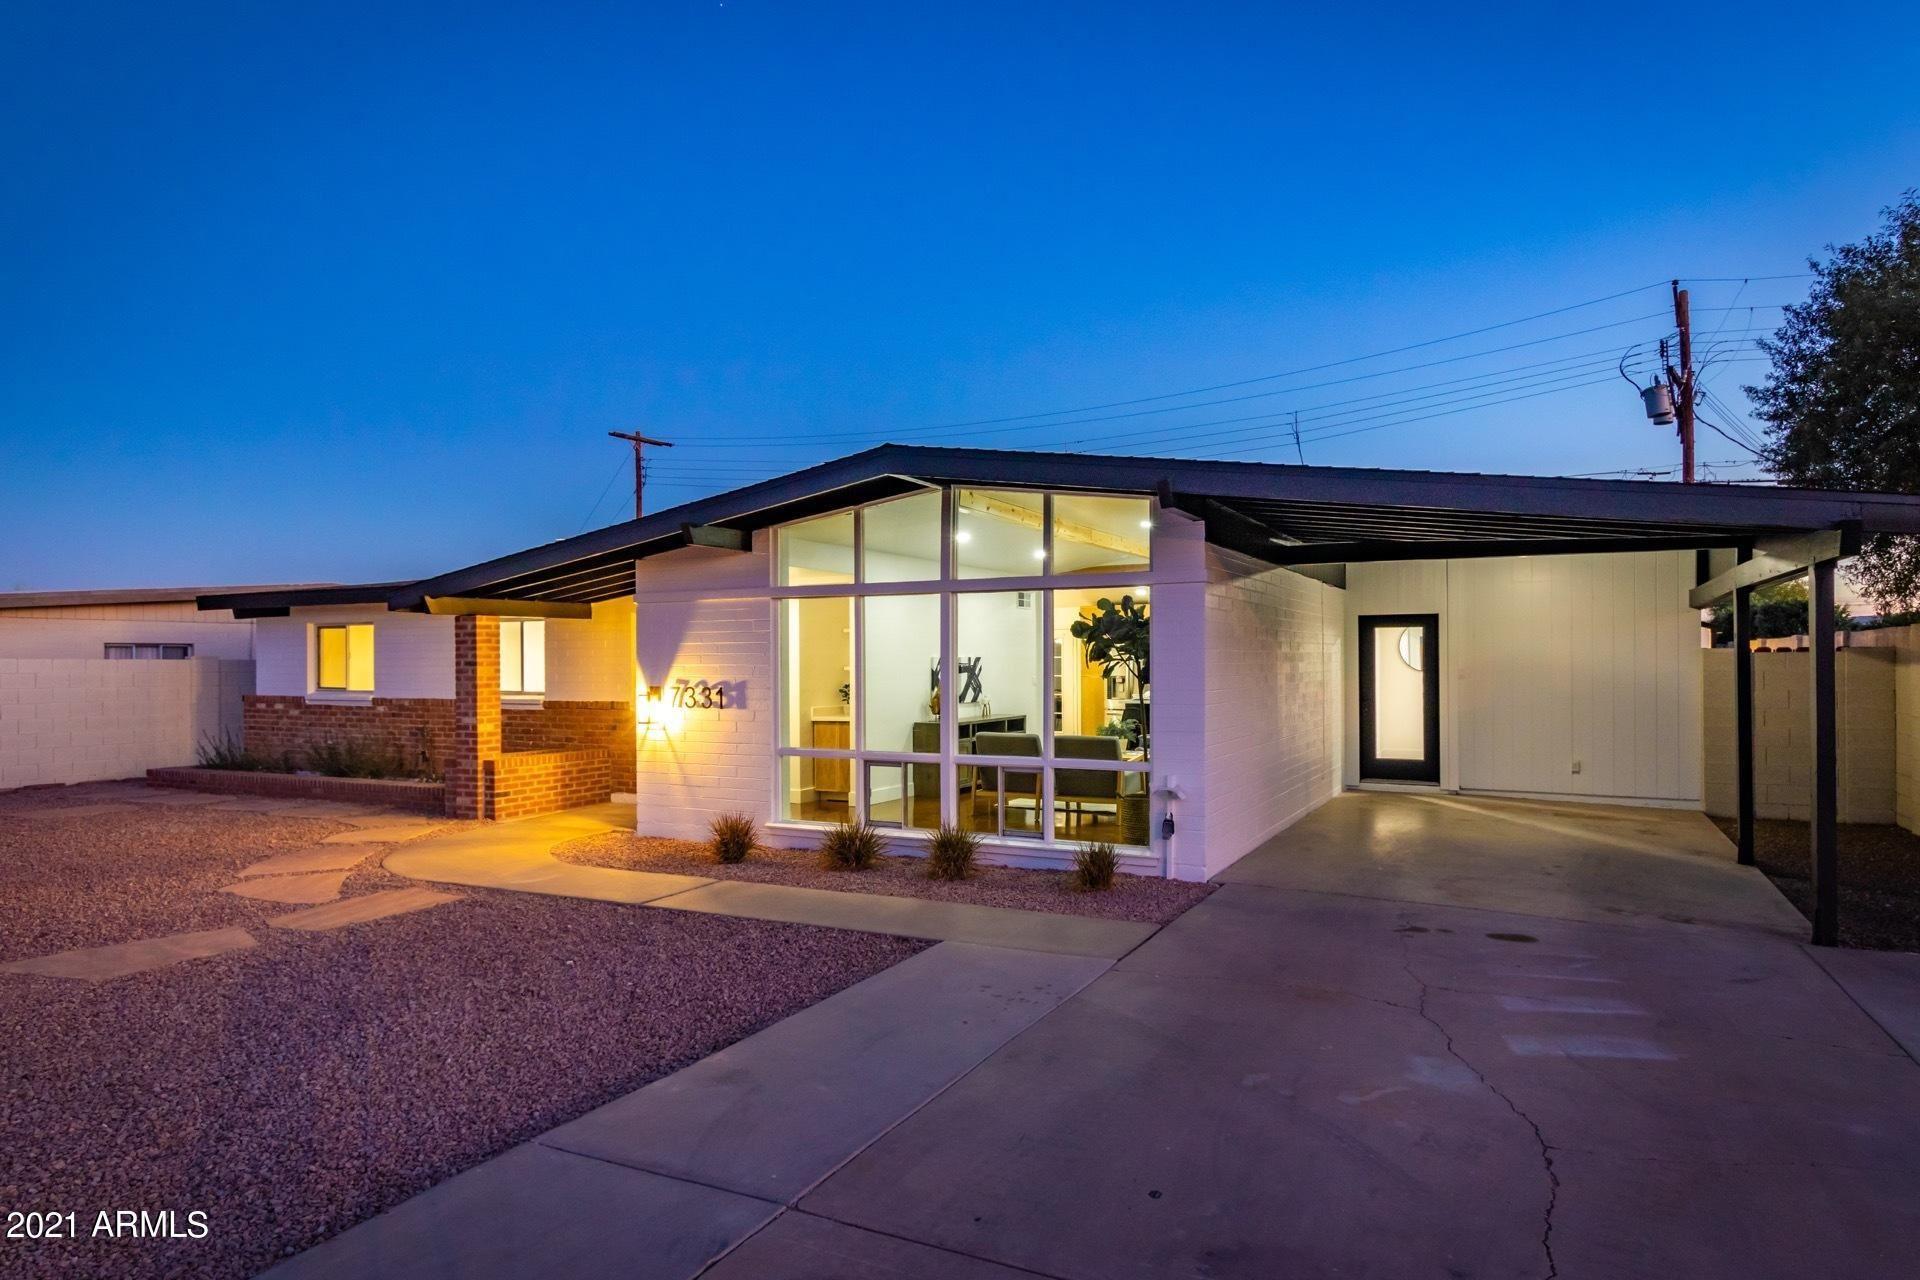 7331 E OAK Street, Scottsdale, AZ 85257 - MLS#: 6198409